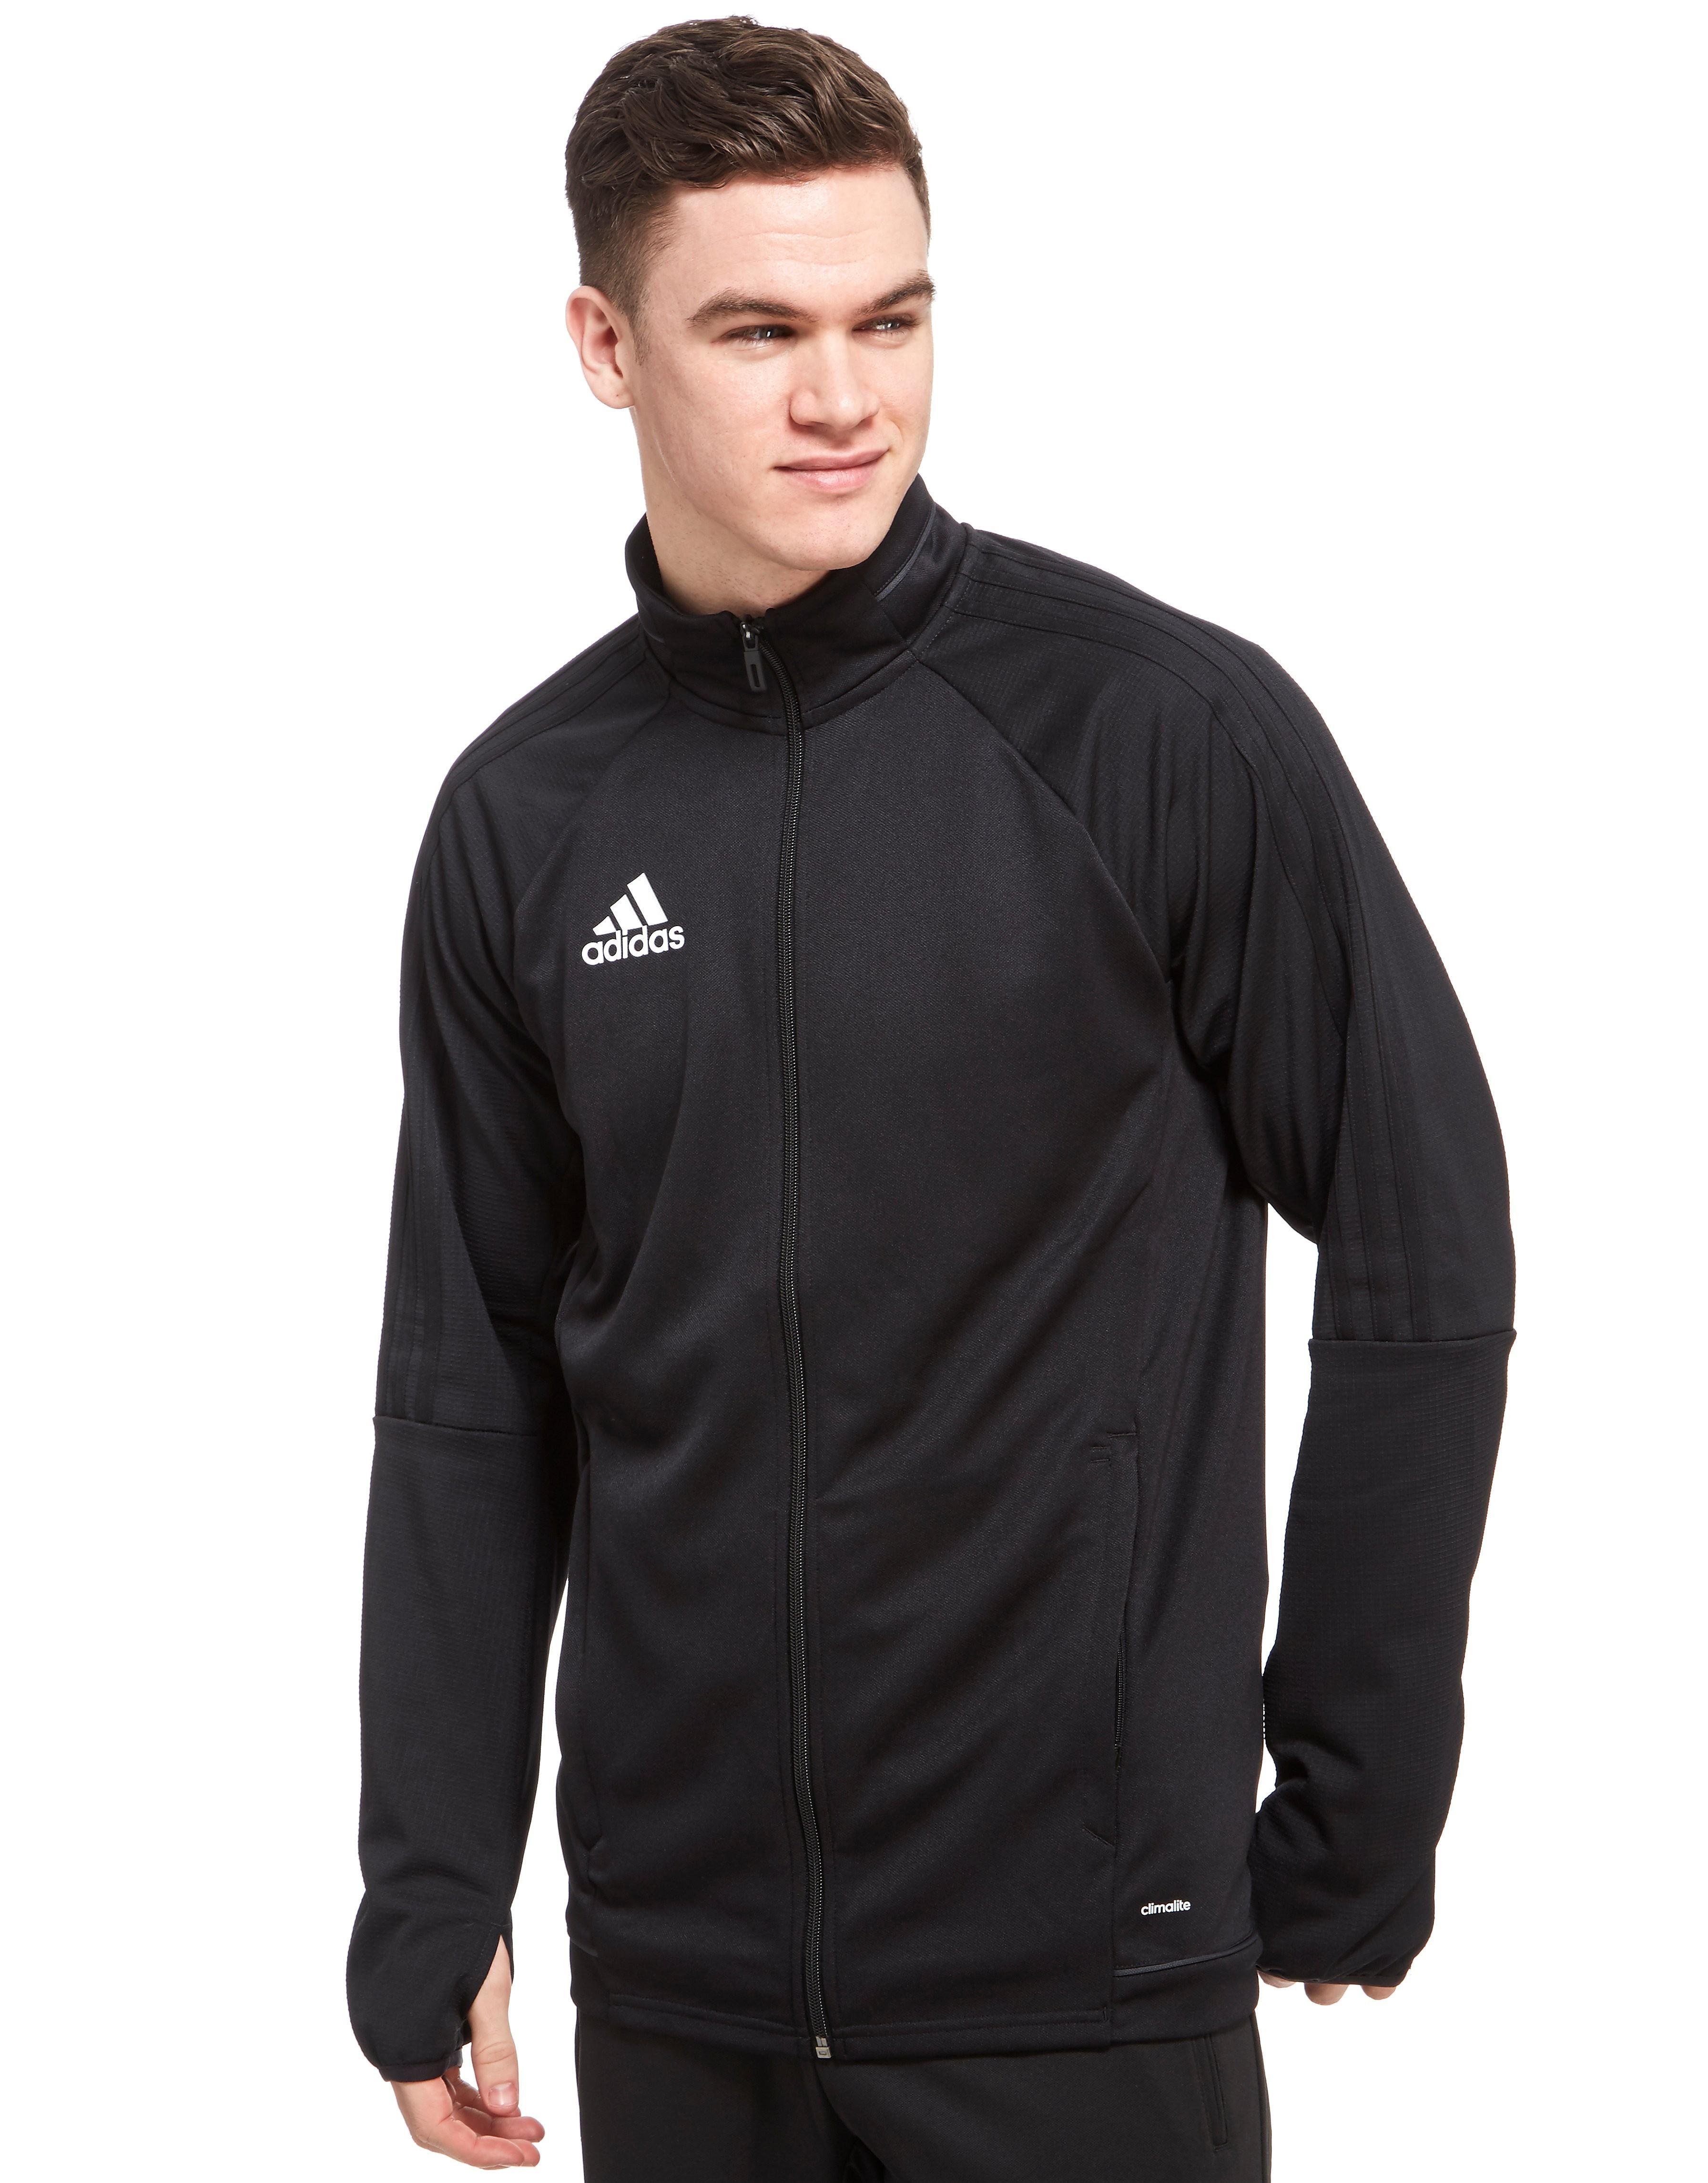 adidas Tiro 17 Woven Training Jacket